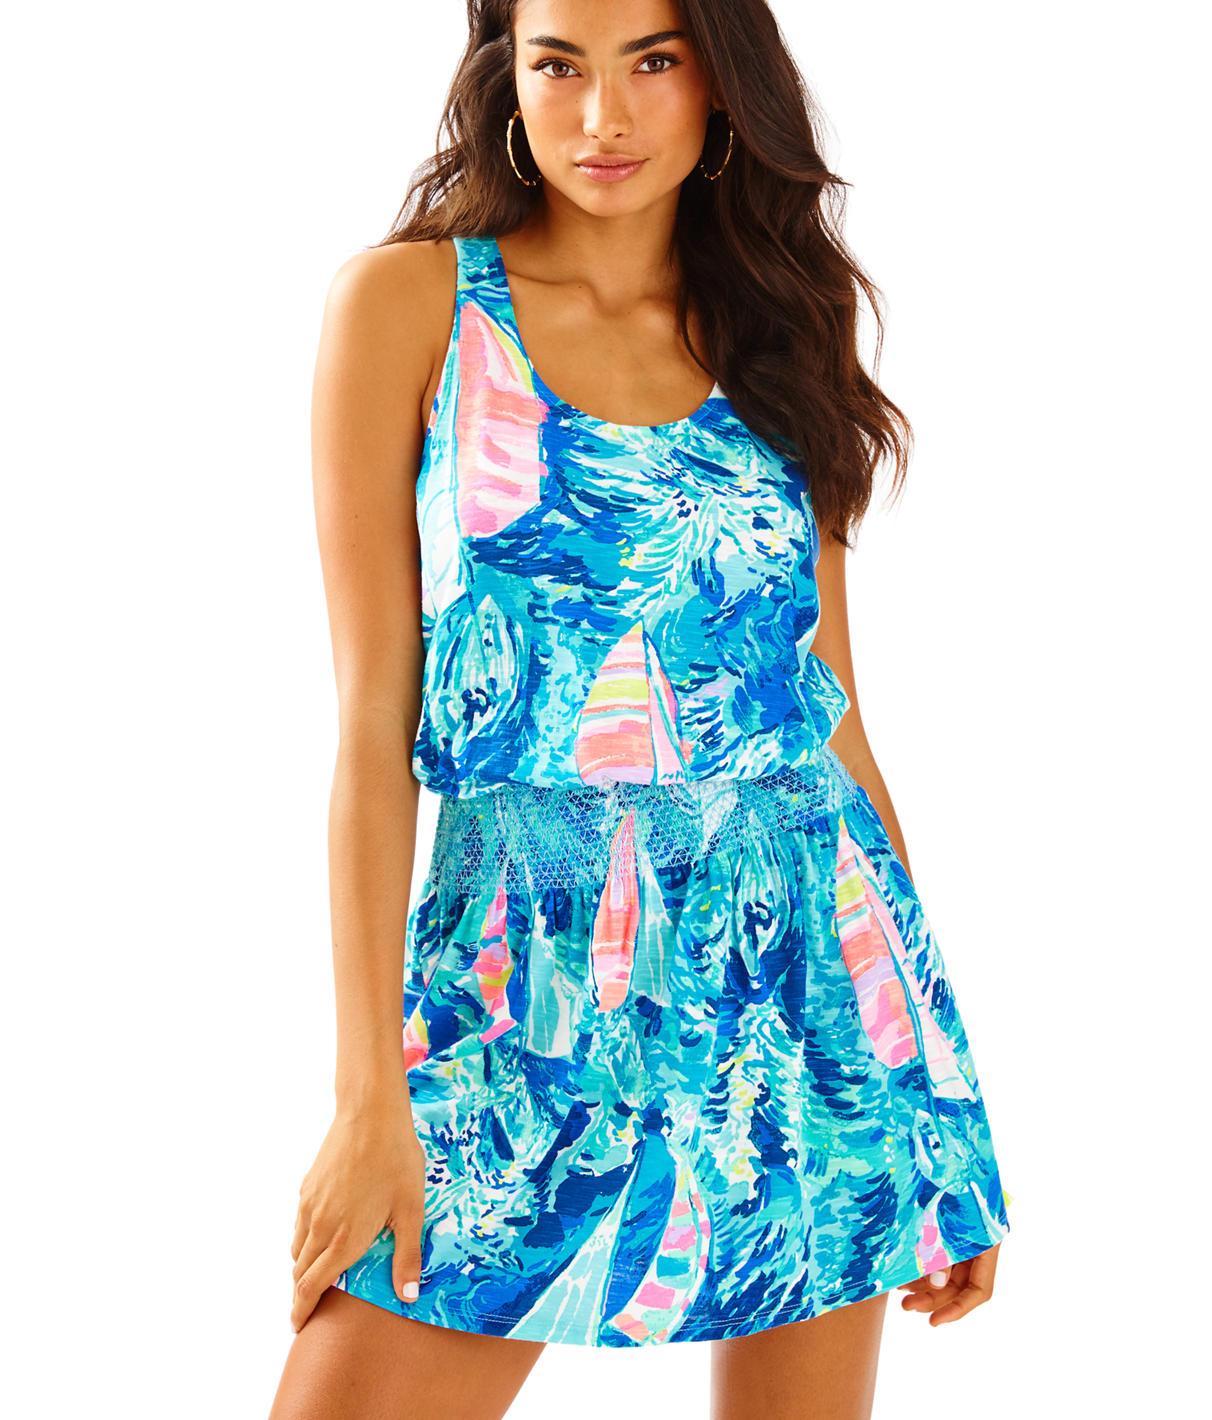 Lilly Pulitzer Tideline Dress